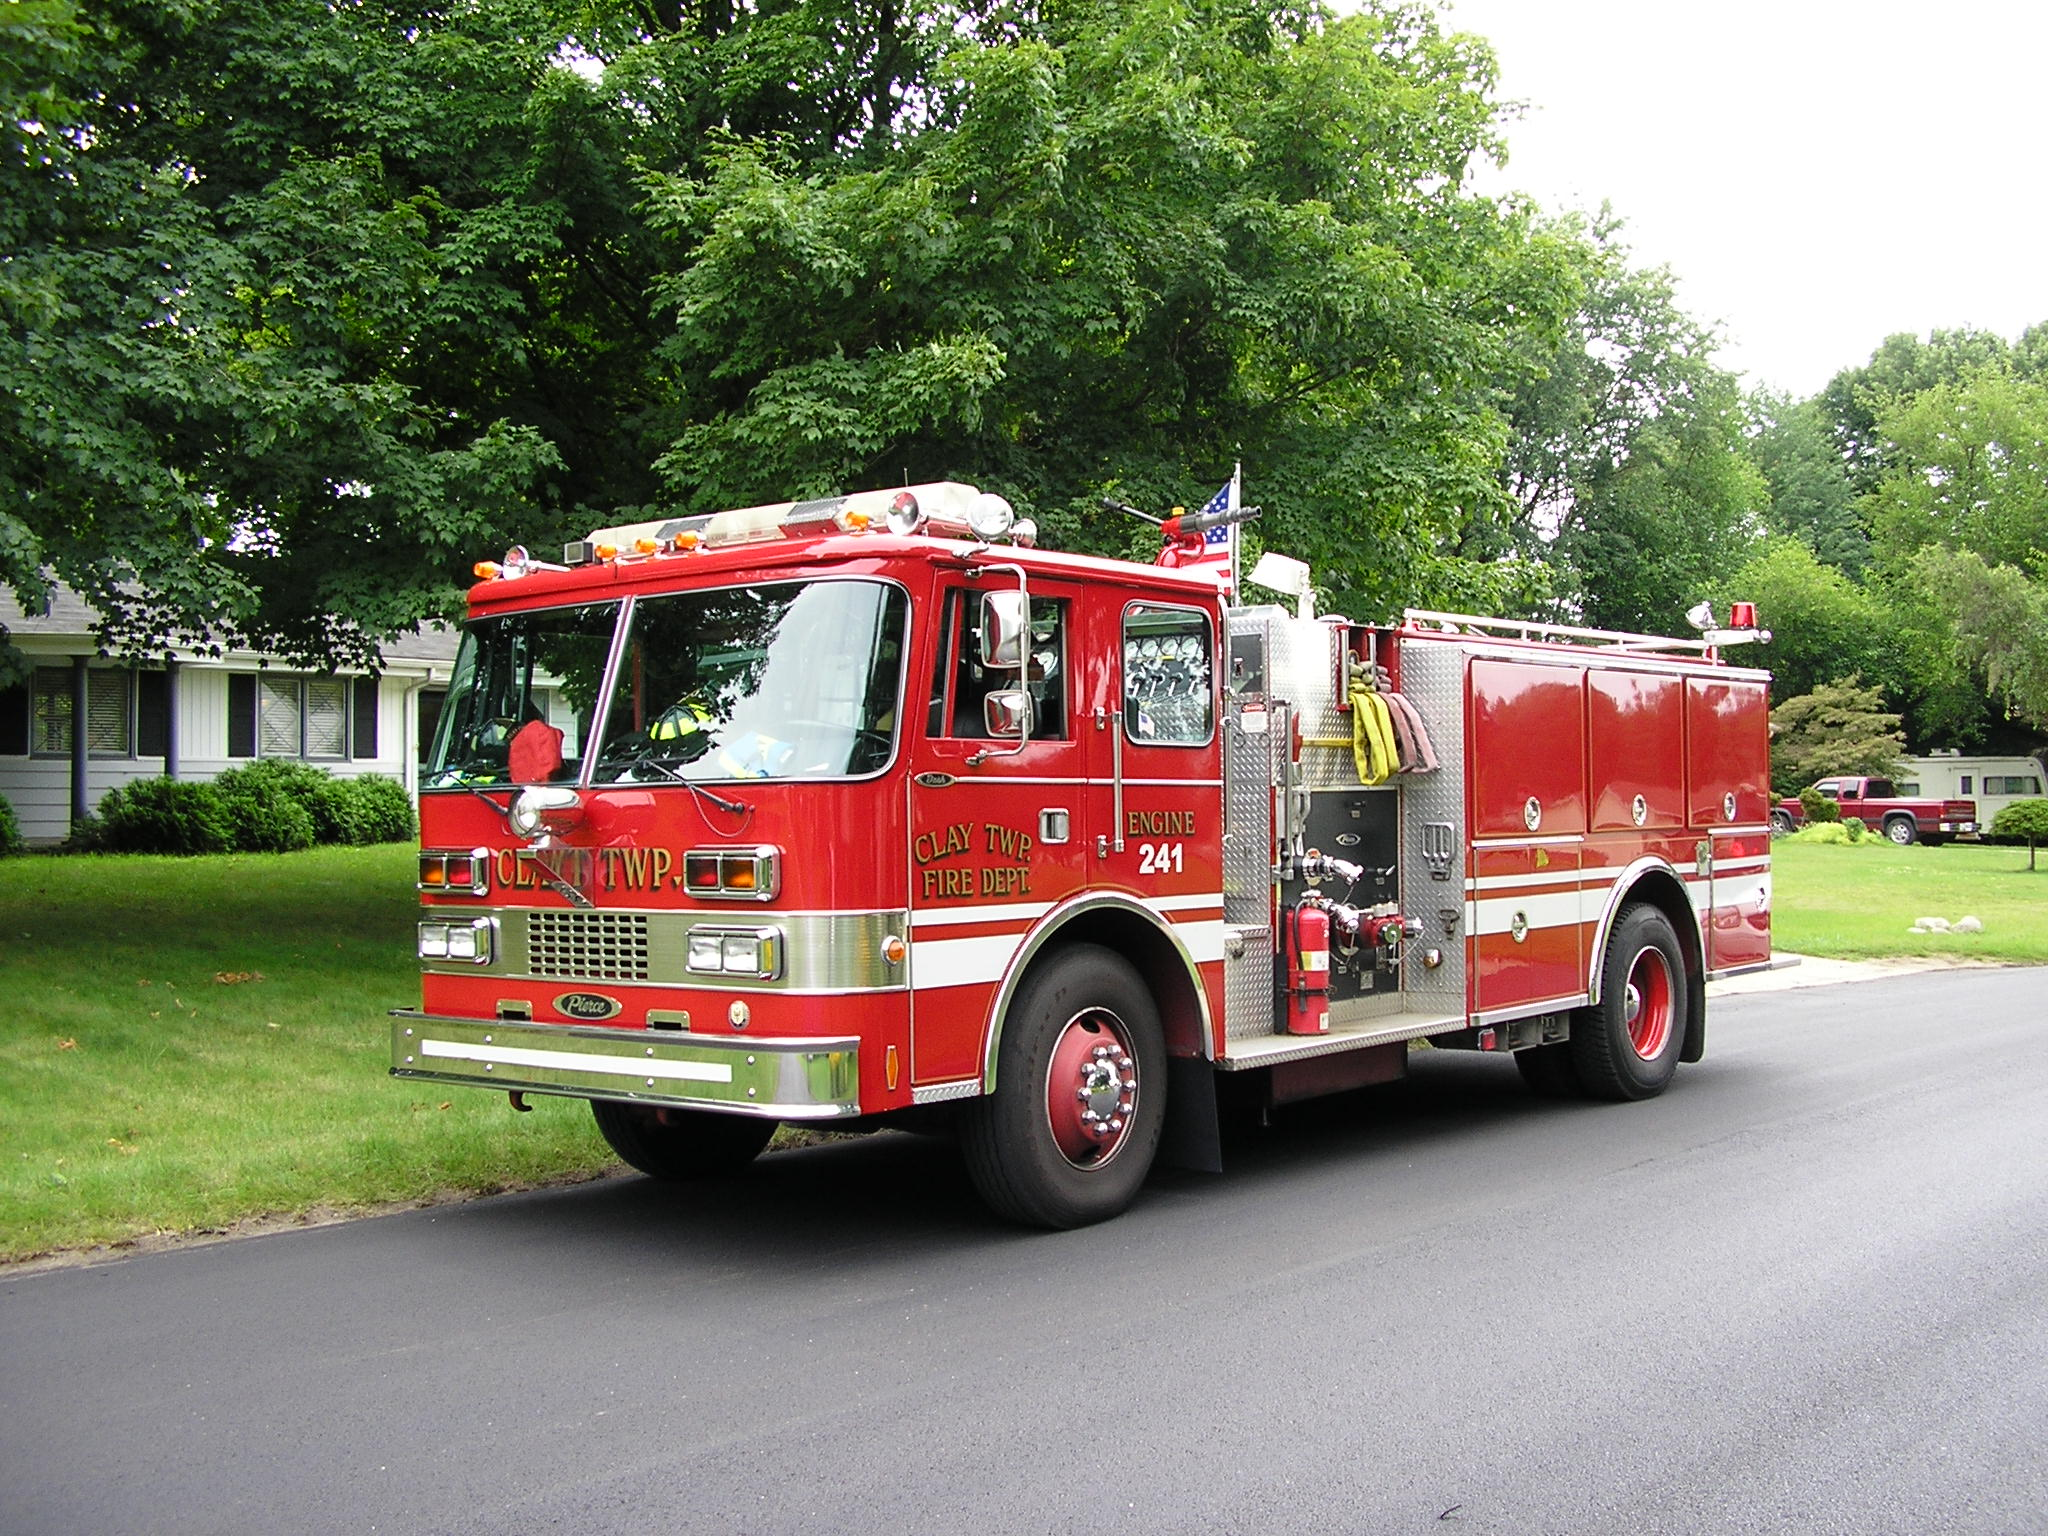 https://i2.wp.com/upload.wikimedia.org/wikipedia/commons/5/54/Fire_Engine_Clay_Twp.jpg